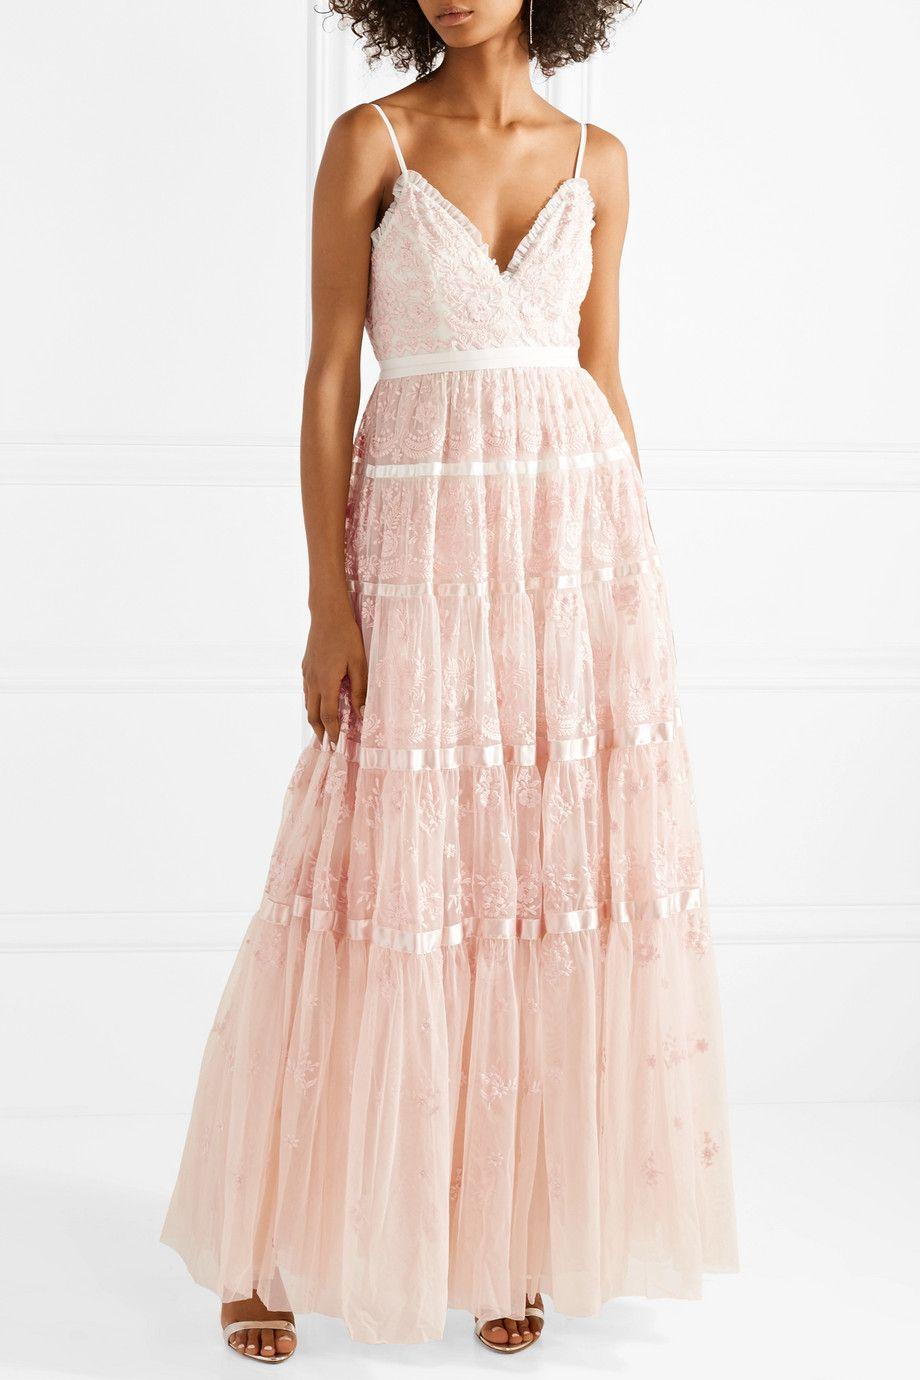 Needle u thread satintrimmed embroidered tulle gown Что надеть